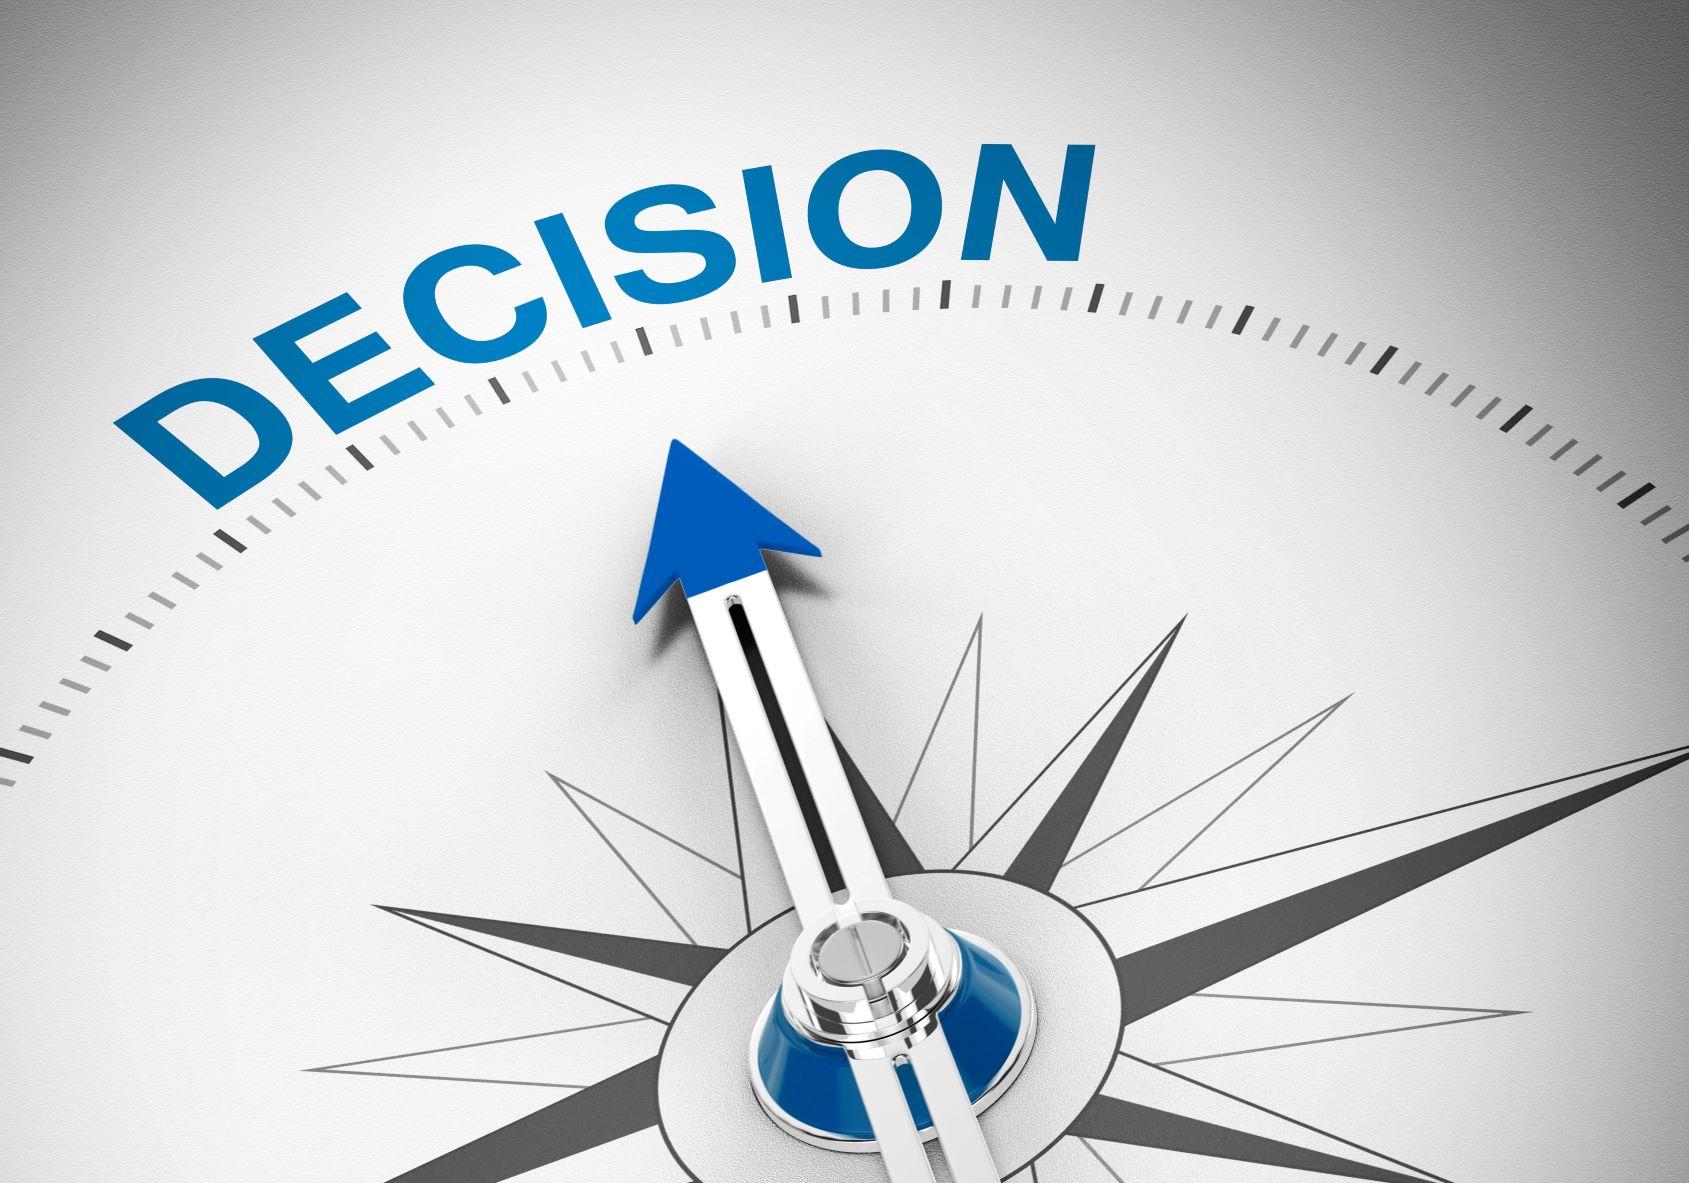 Decision compass